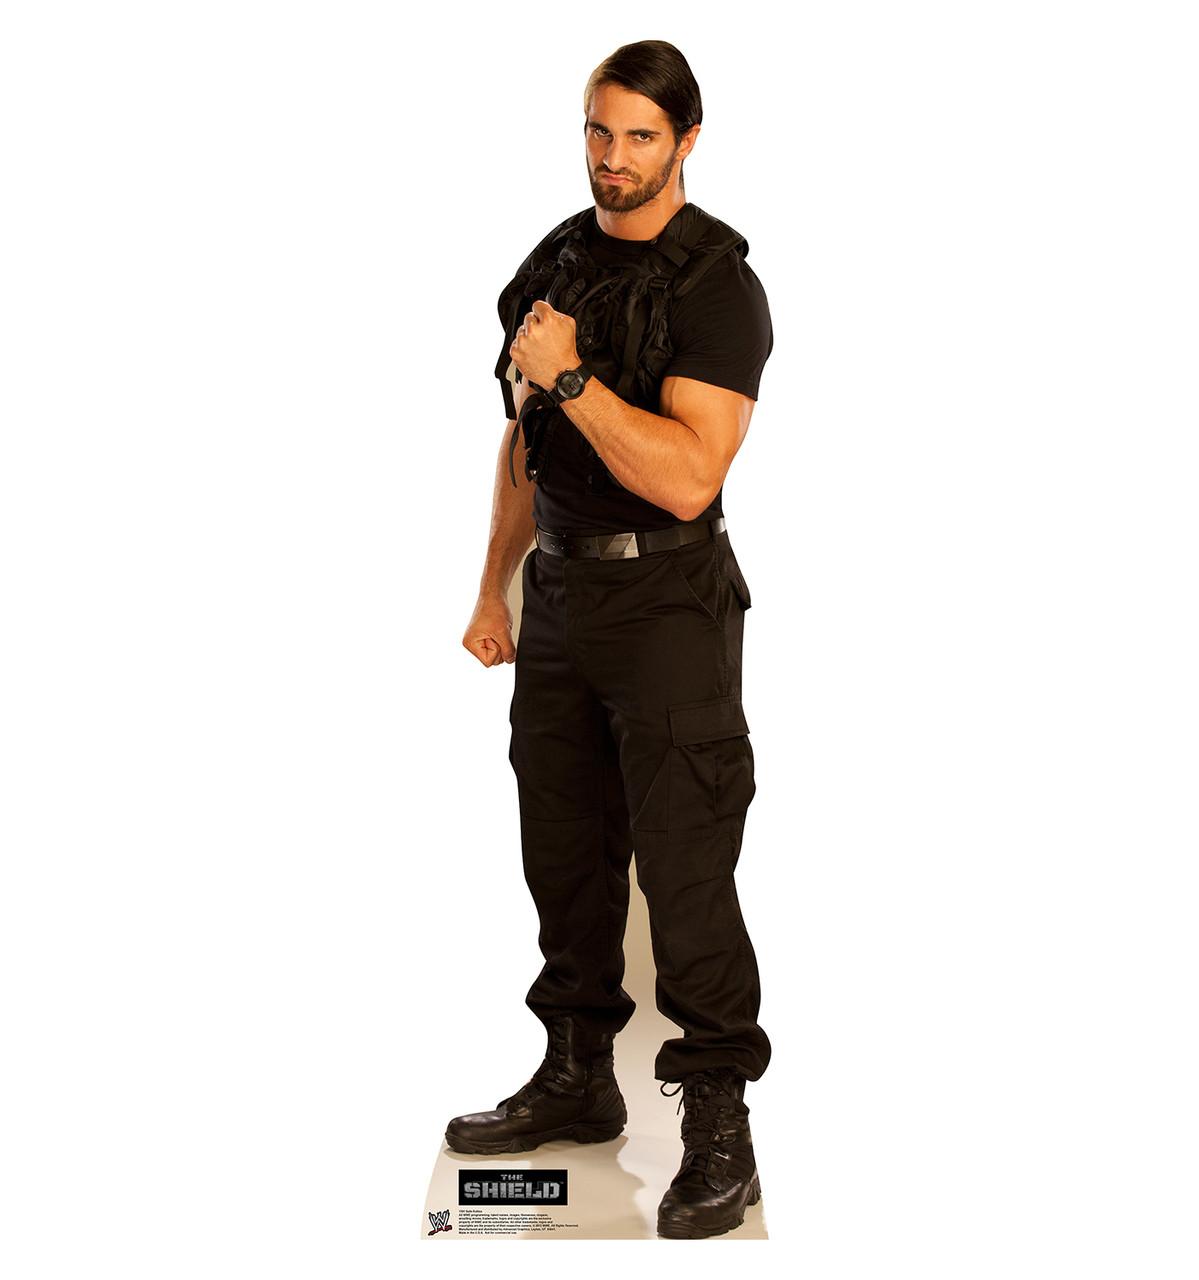 Life-size Seth Rollins - WWE Cardboard Standup